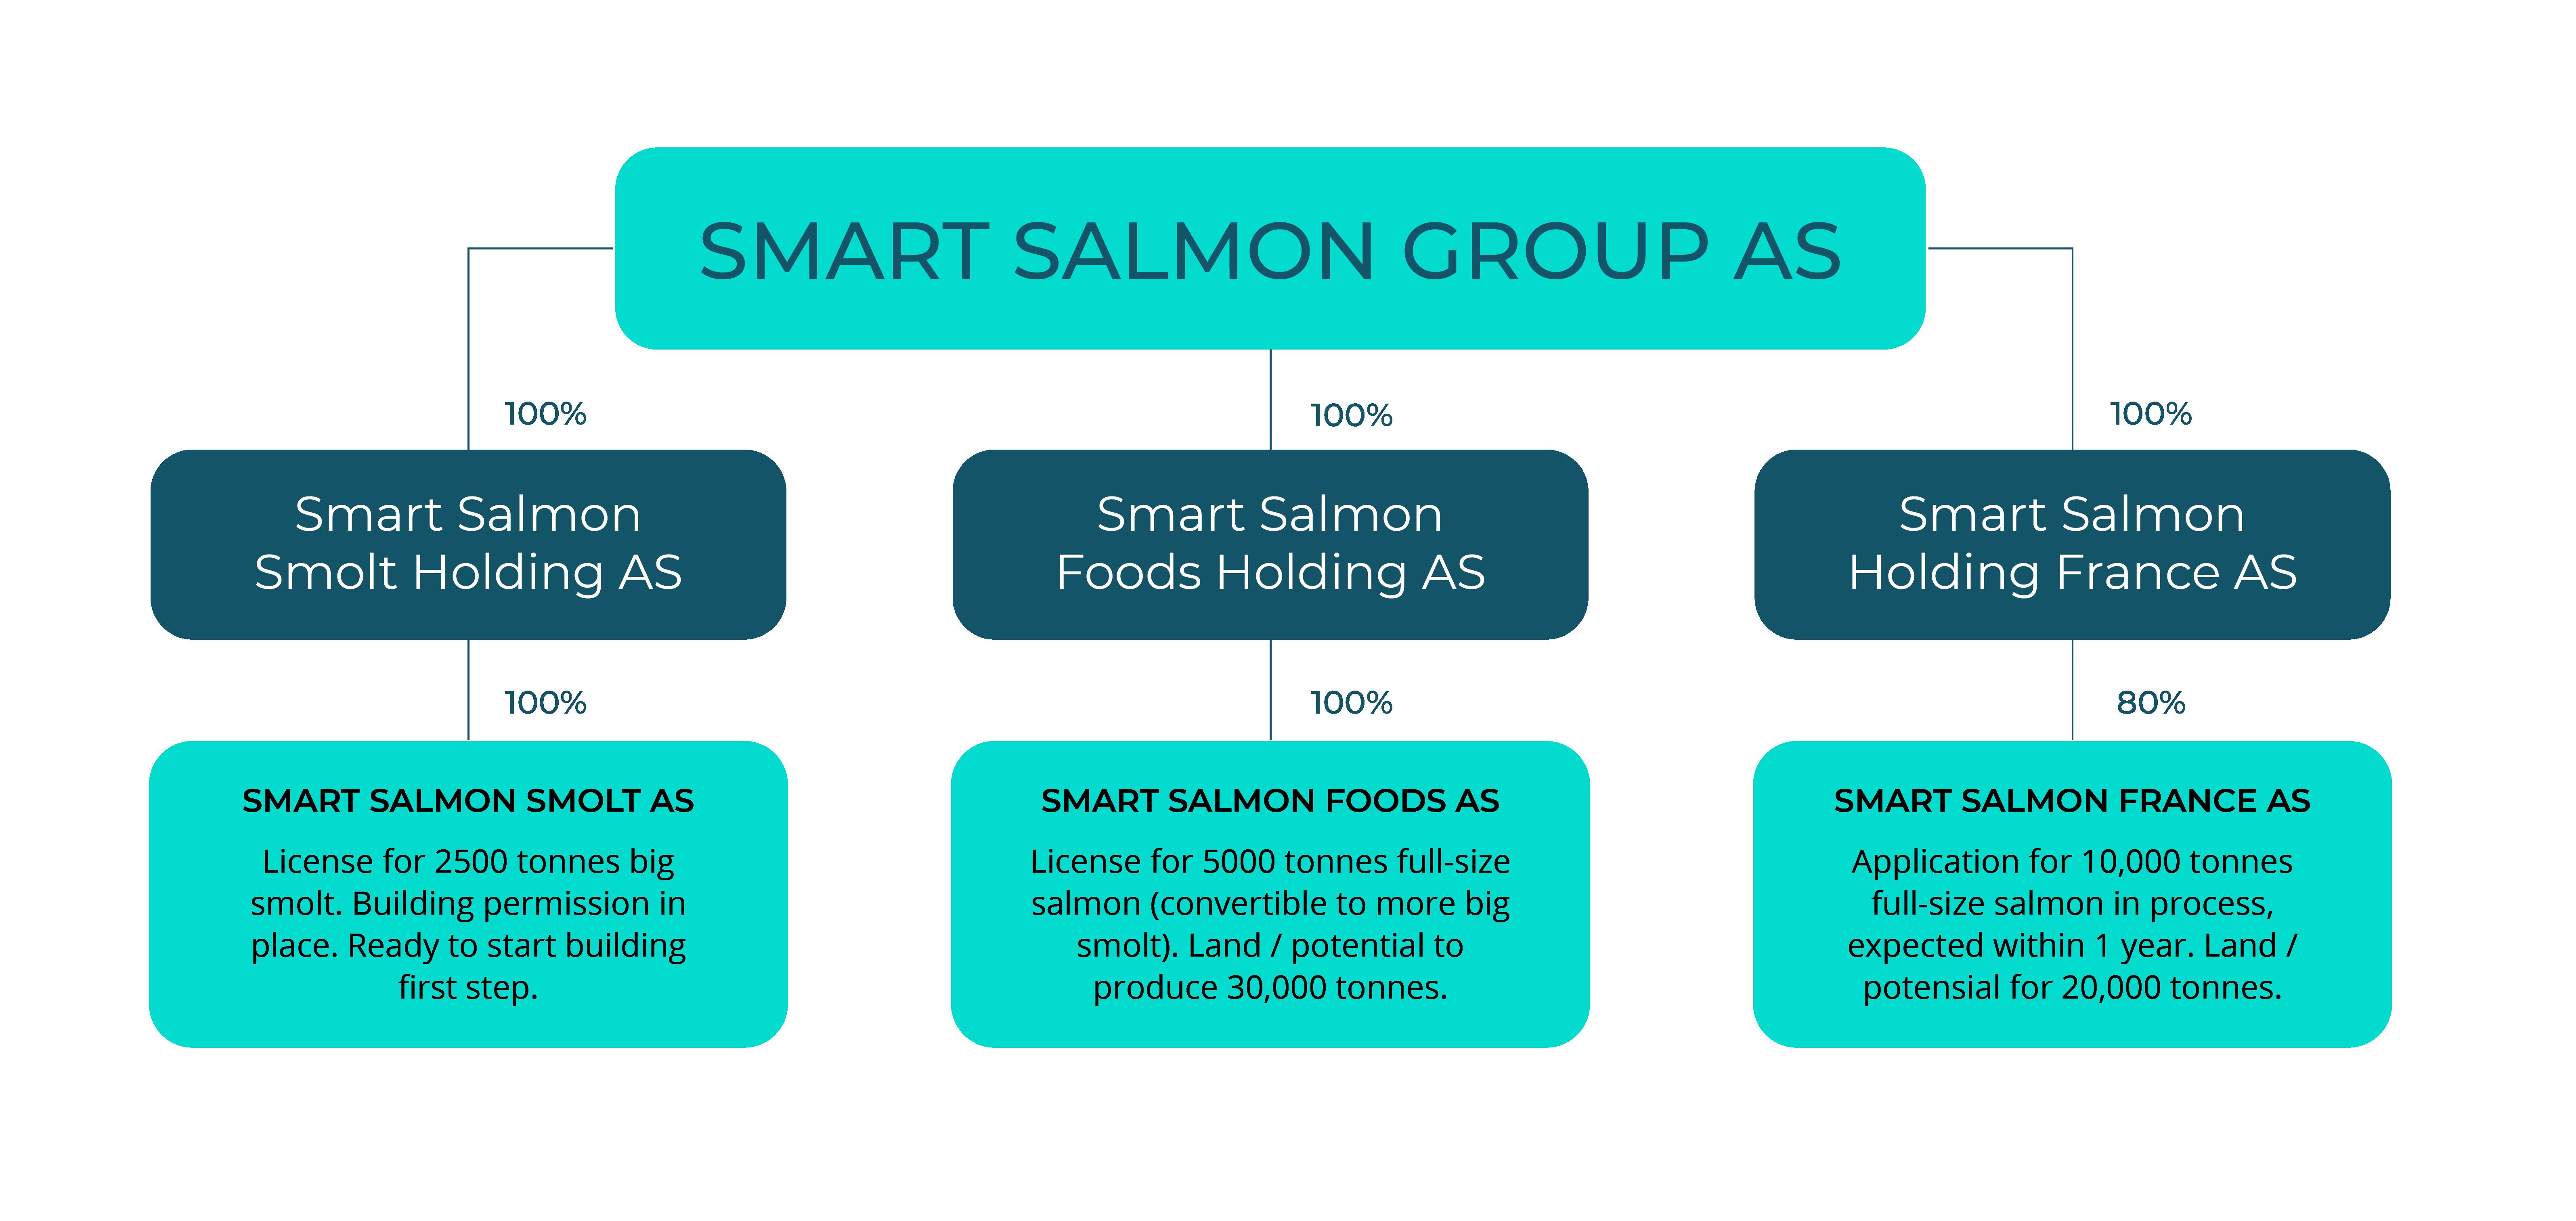 Smart Salmon Org Chart - smartsalmon.no